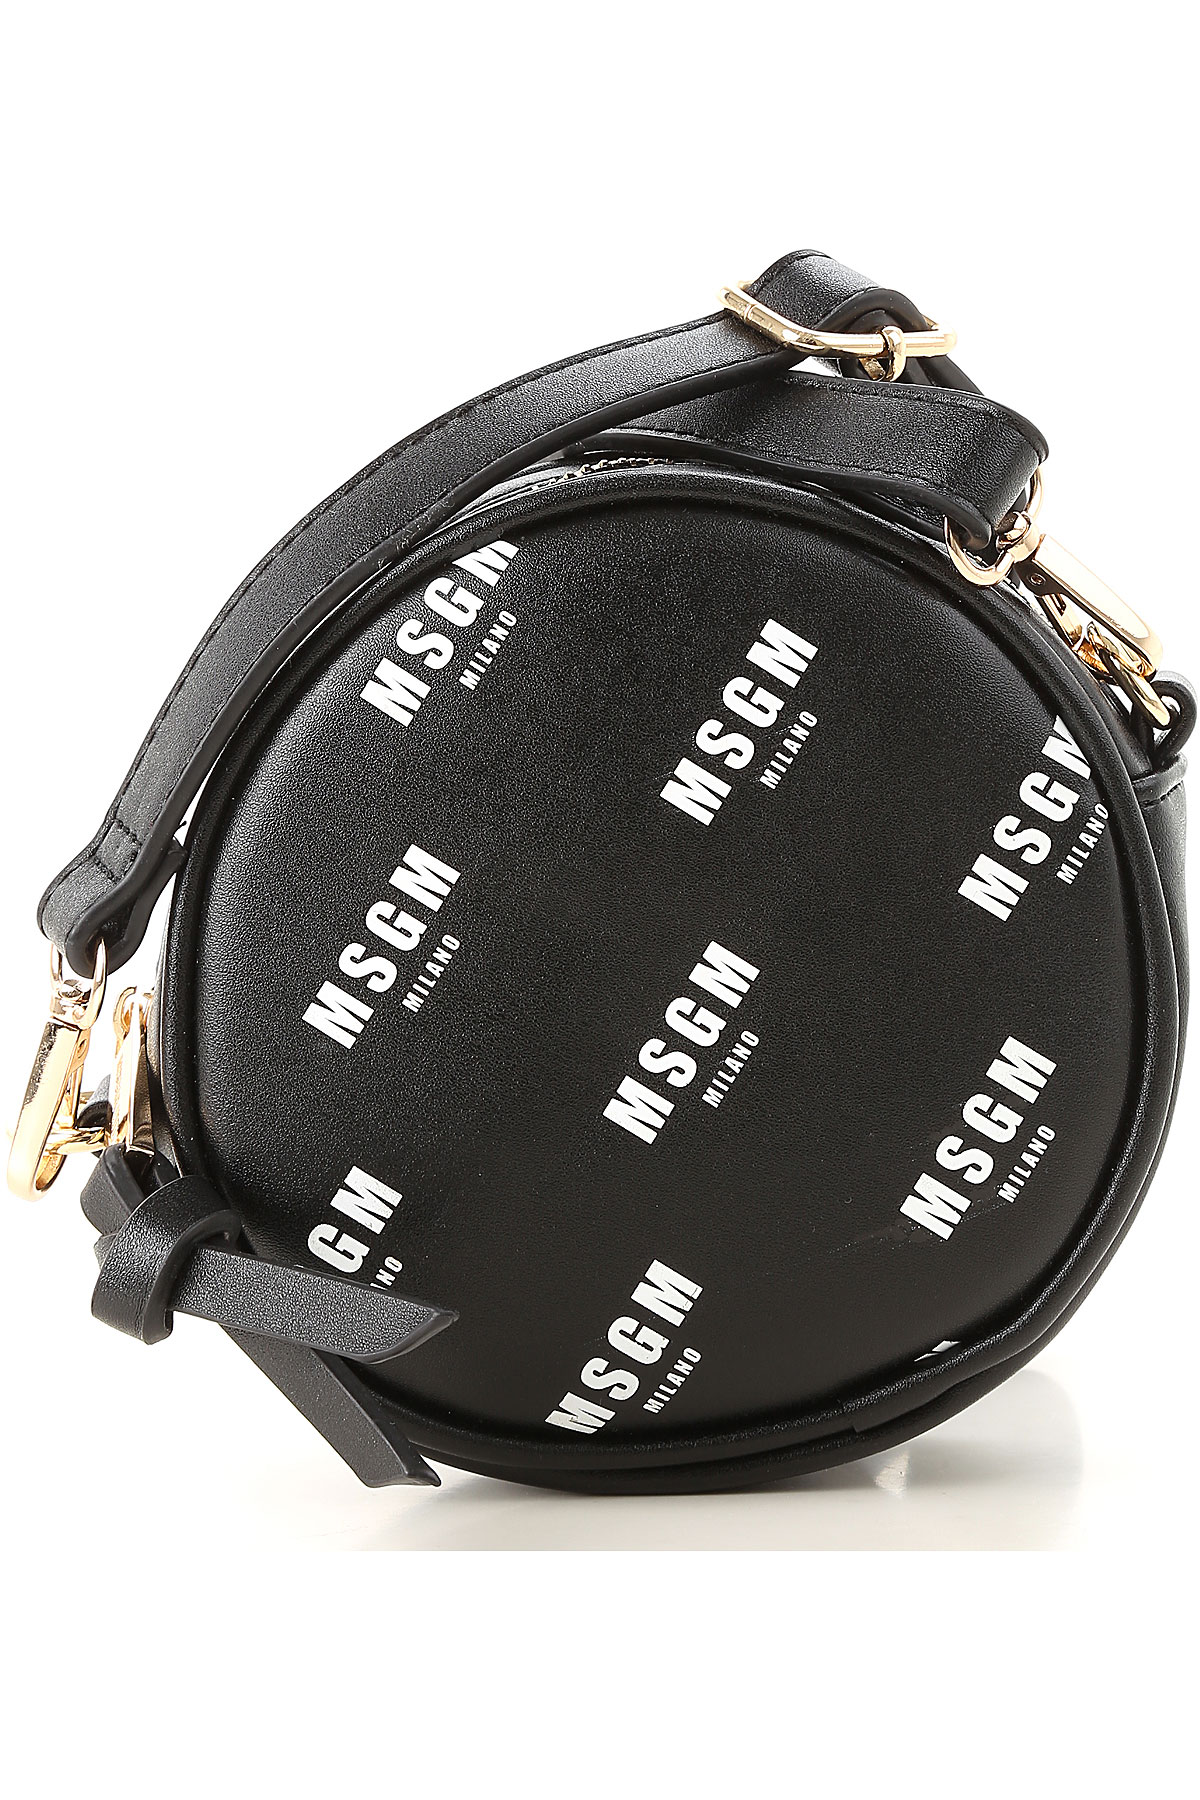 Image of MSGM Girls Handbag, Black, Eco Leather, 2017